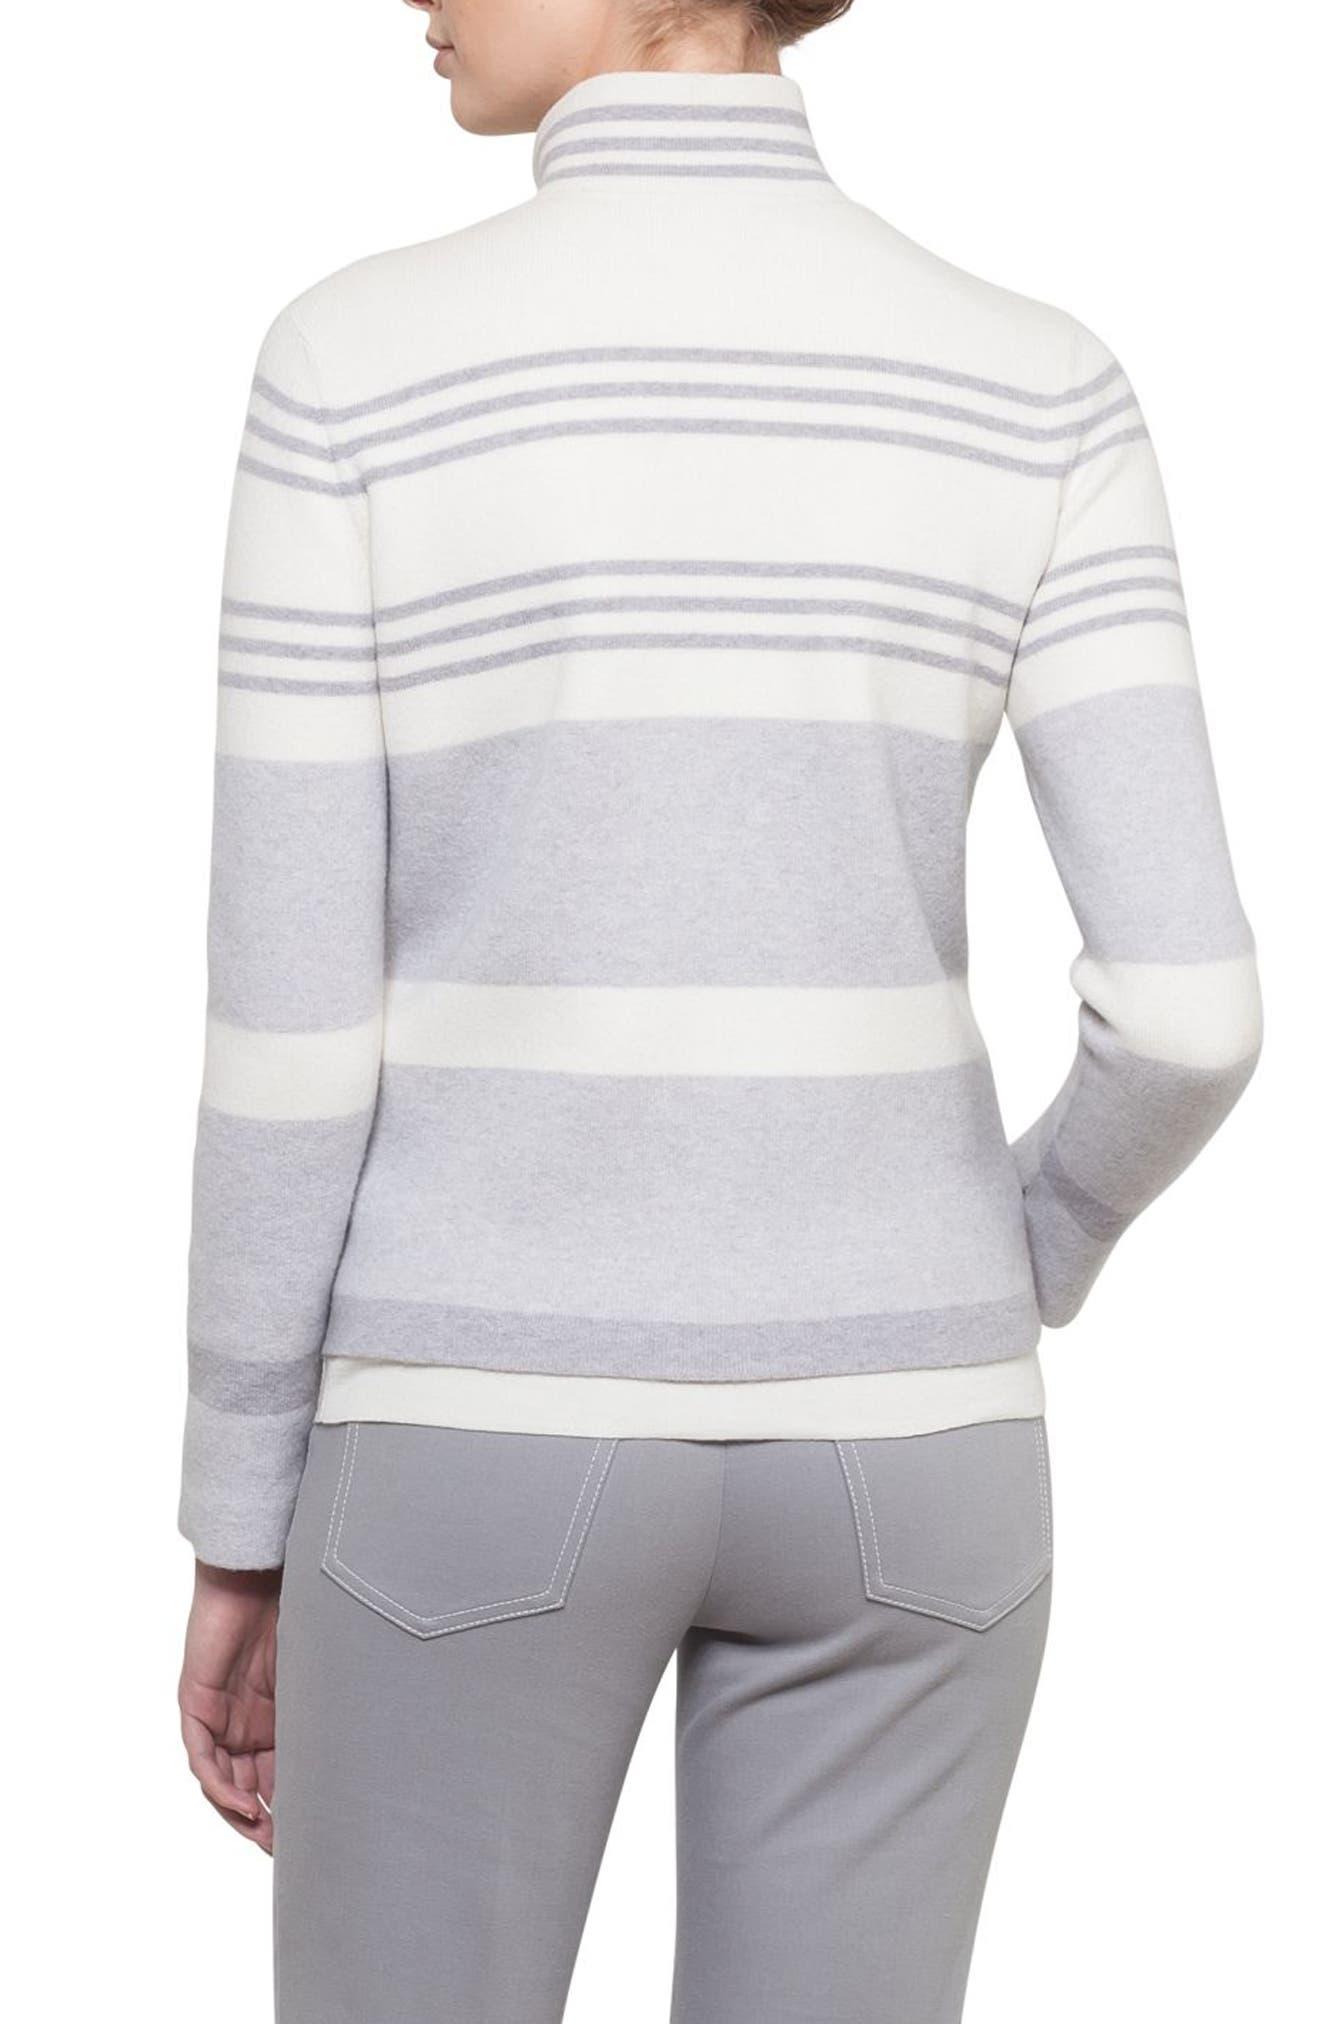 Stripe Knit Cashmere Jacket,                             Alternate thumbnail 2, color,                             020